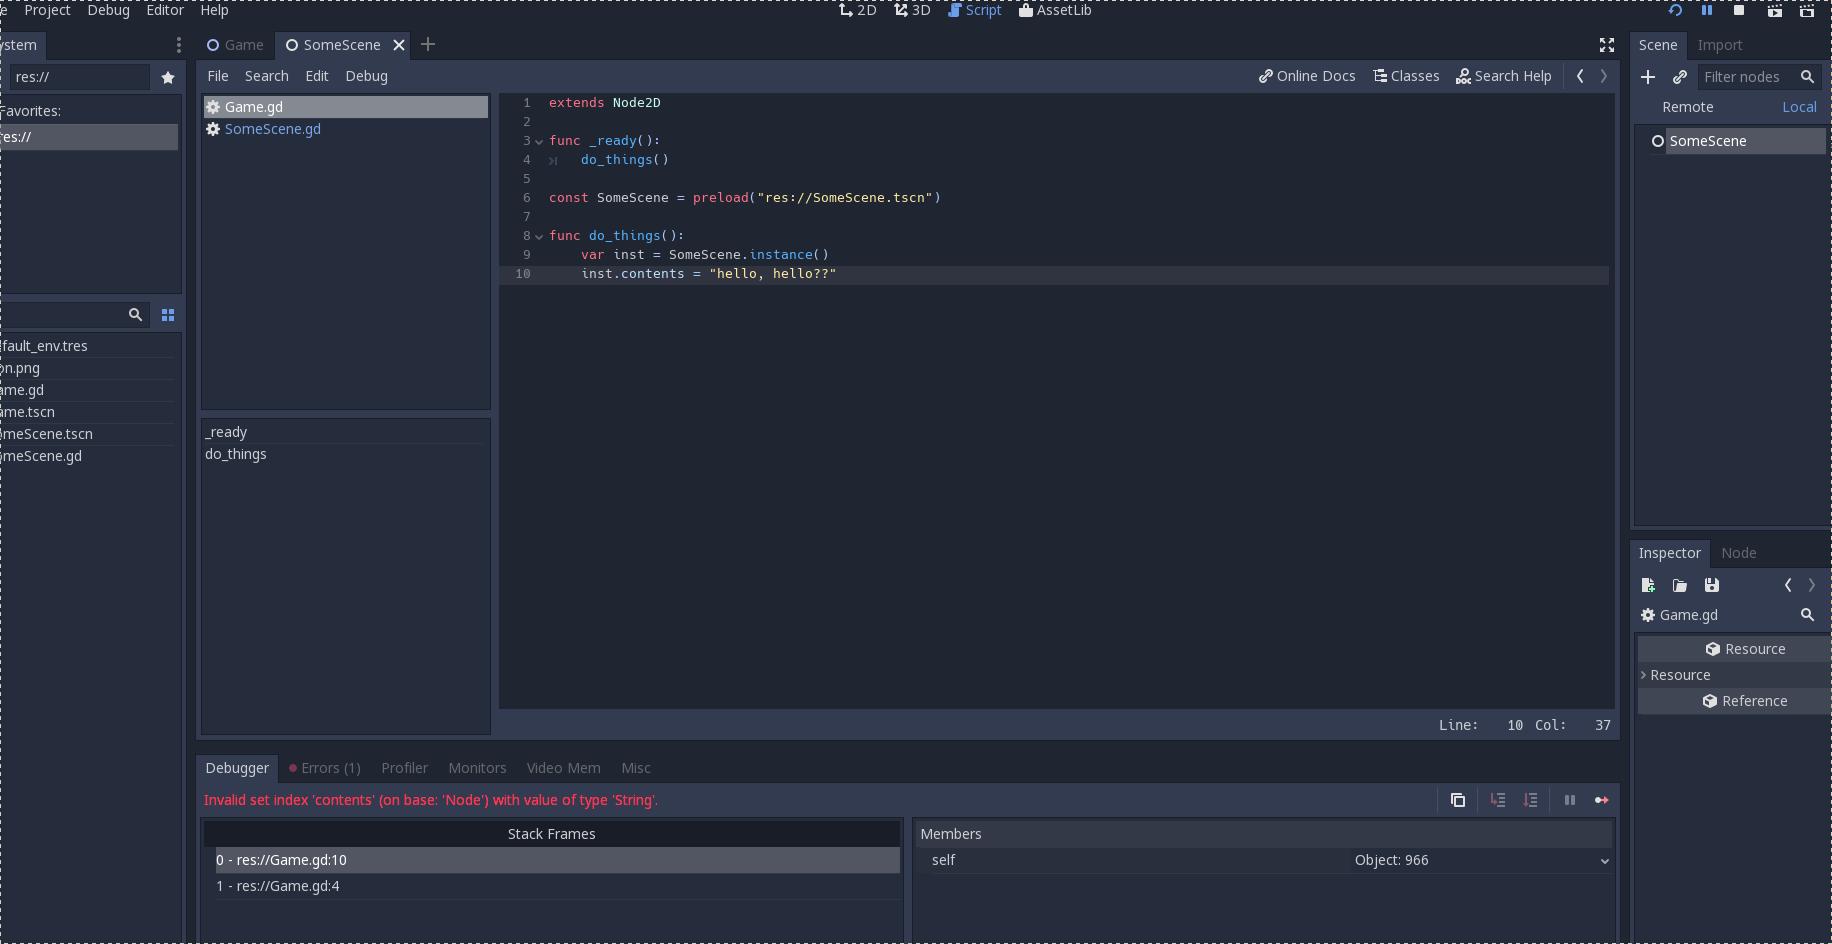 _init method that has parameters shows non-descriptive error · Issue